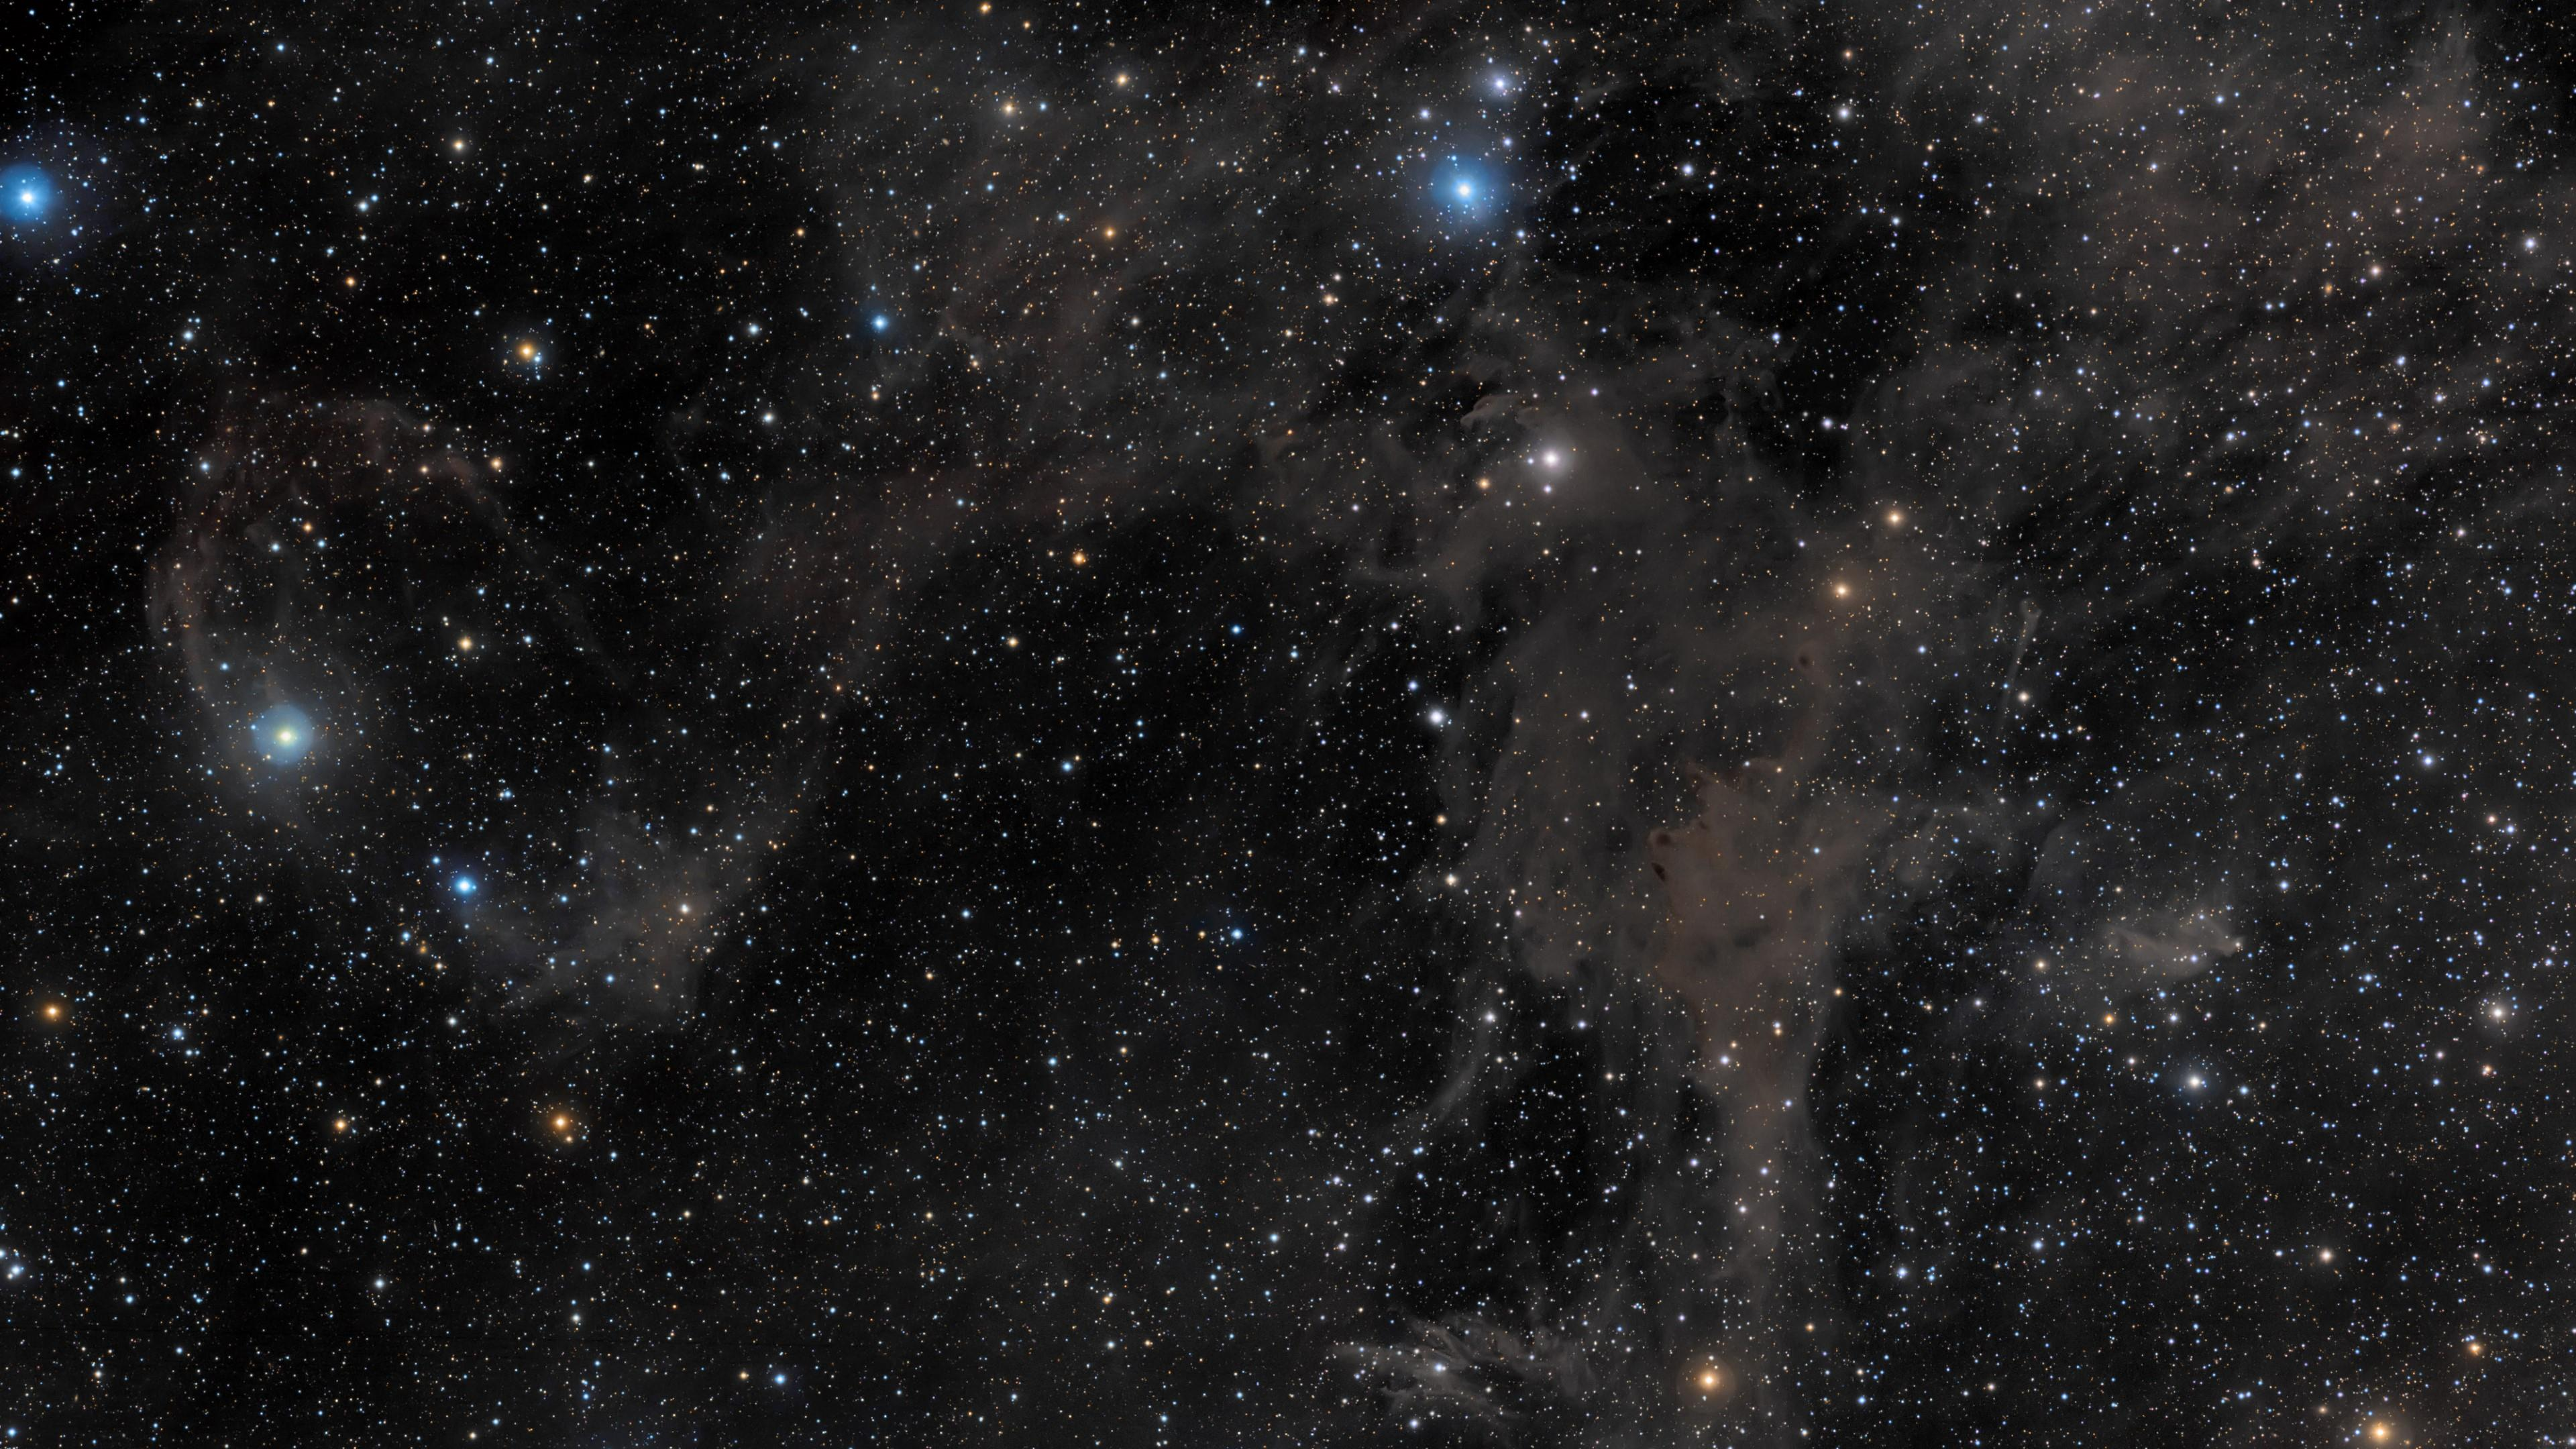 Starry Sky ✨ Wallpaper | Wallpaper Studio 10 | Tens of thousands HD ...